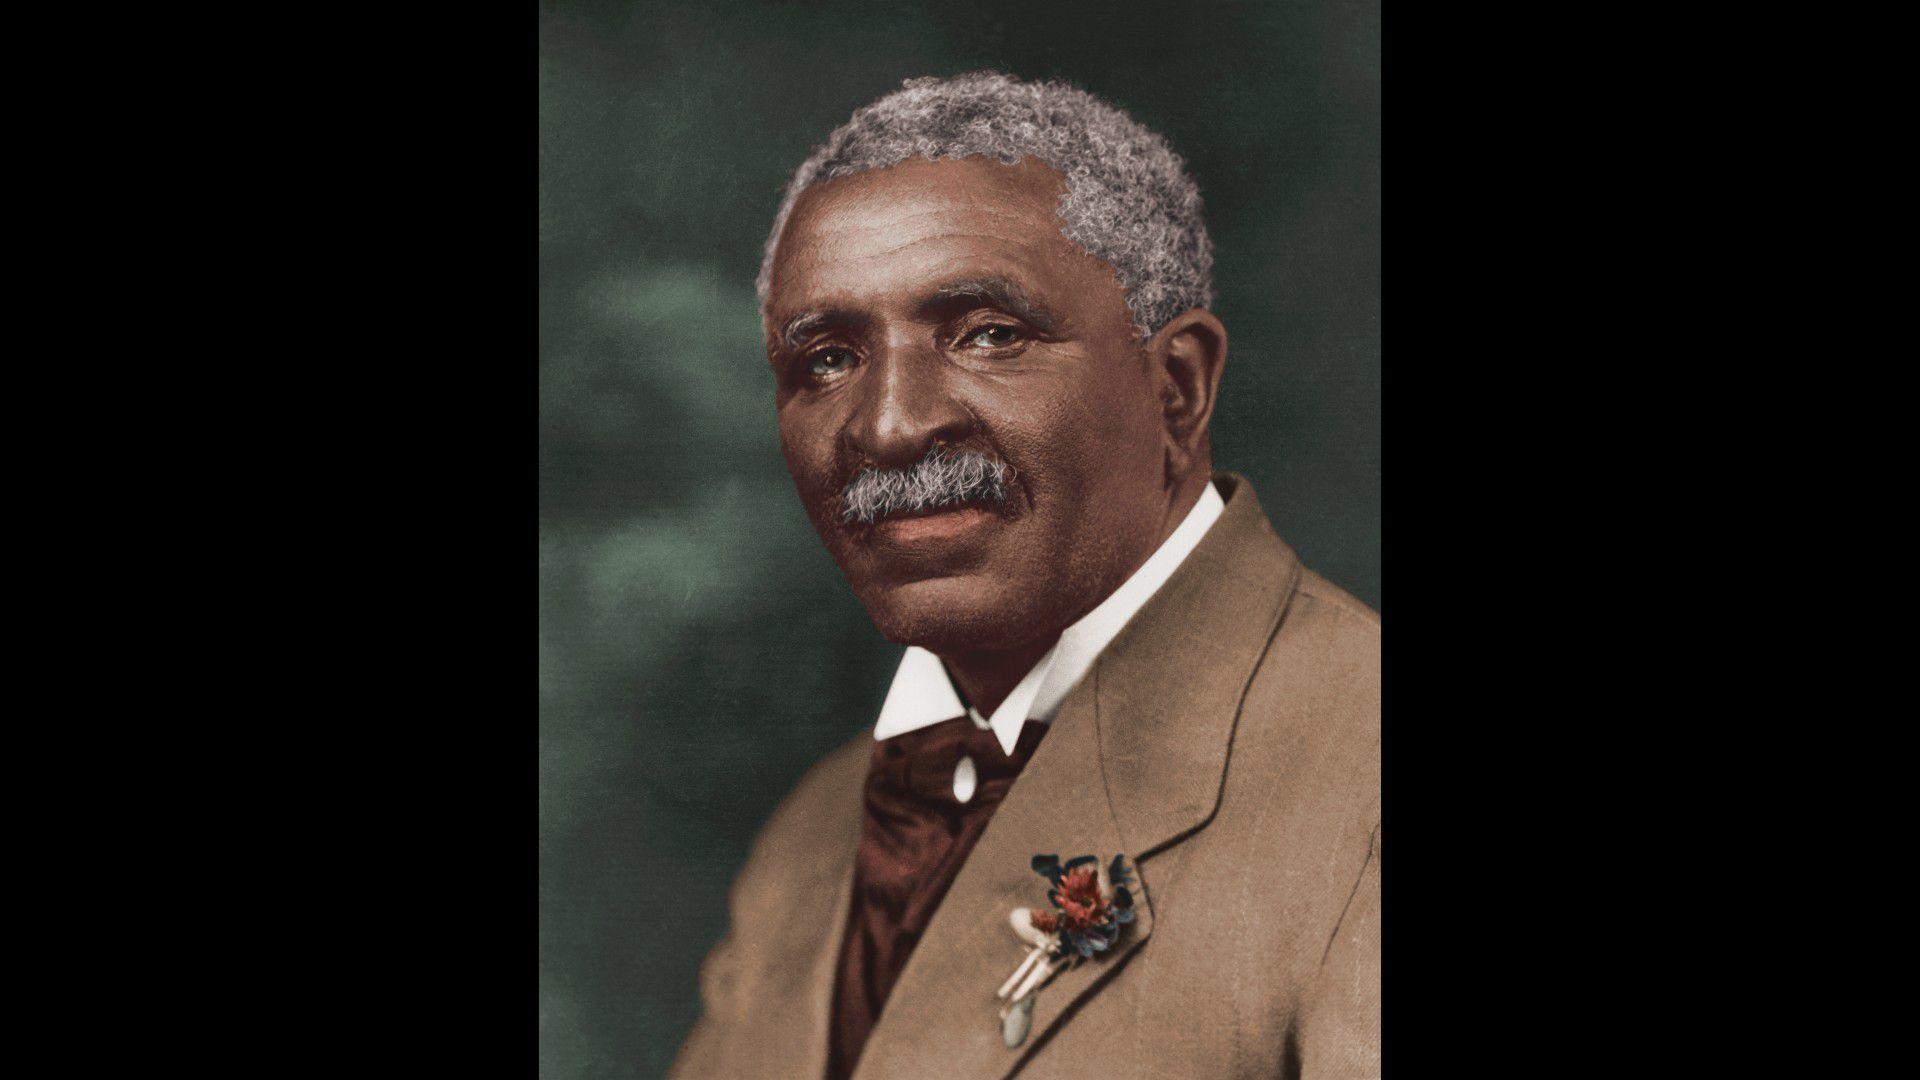 George Washington Carver Agricultural Chemist